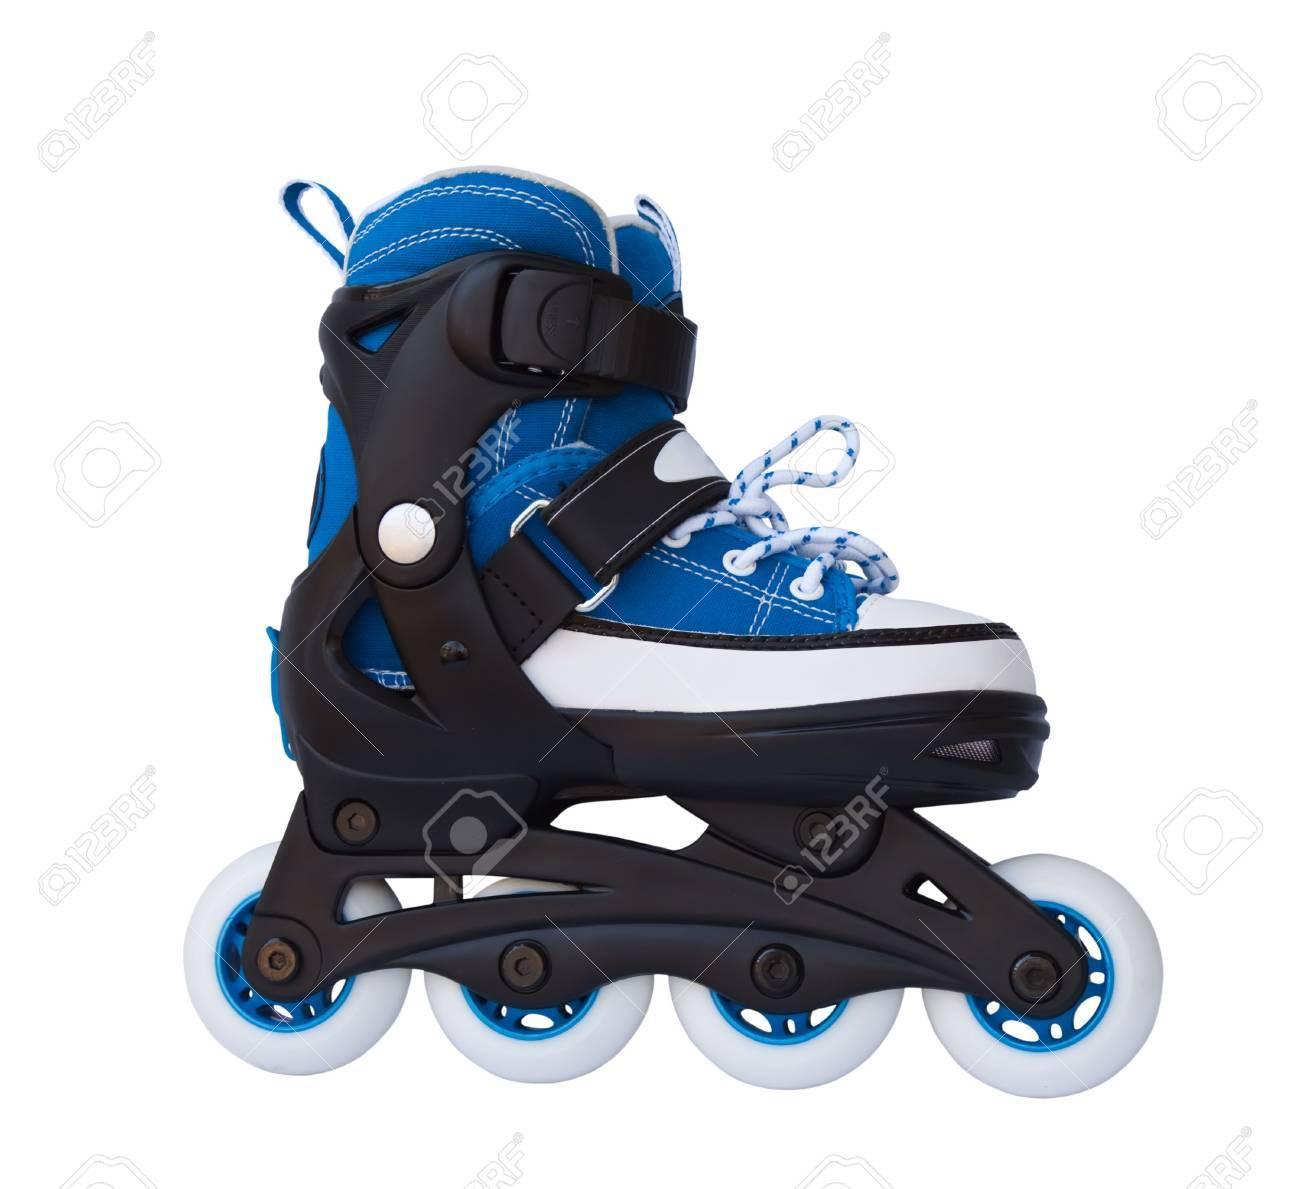 Roller skates blue - Blue Roller Skates Isolated On A White Background Stock Photo 6671127